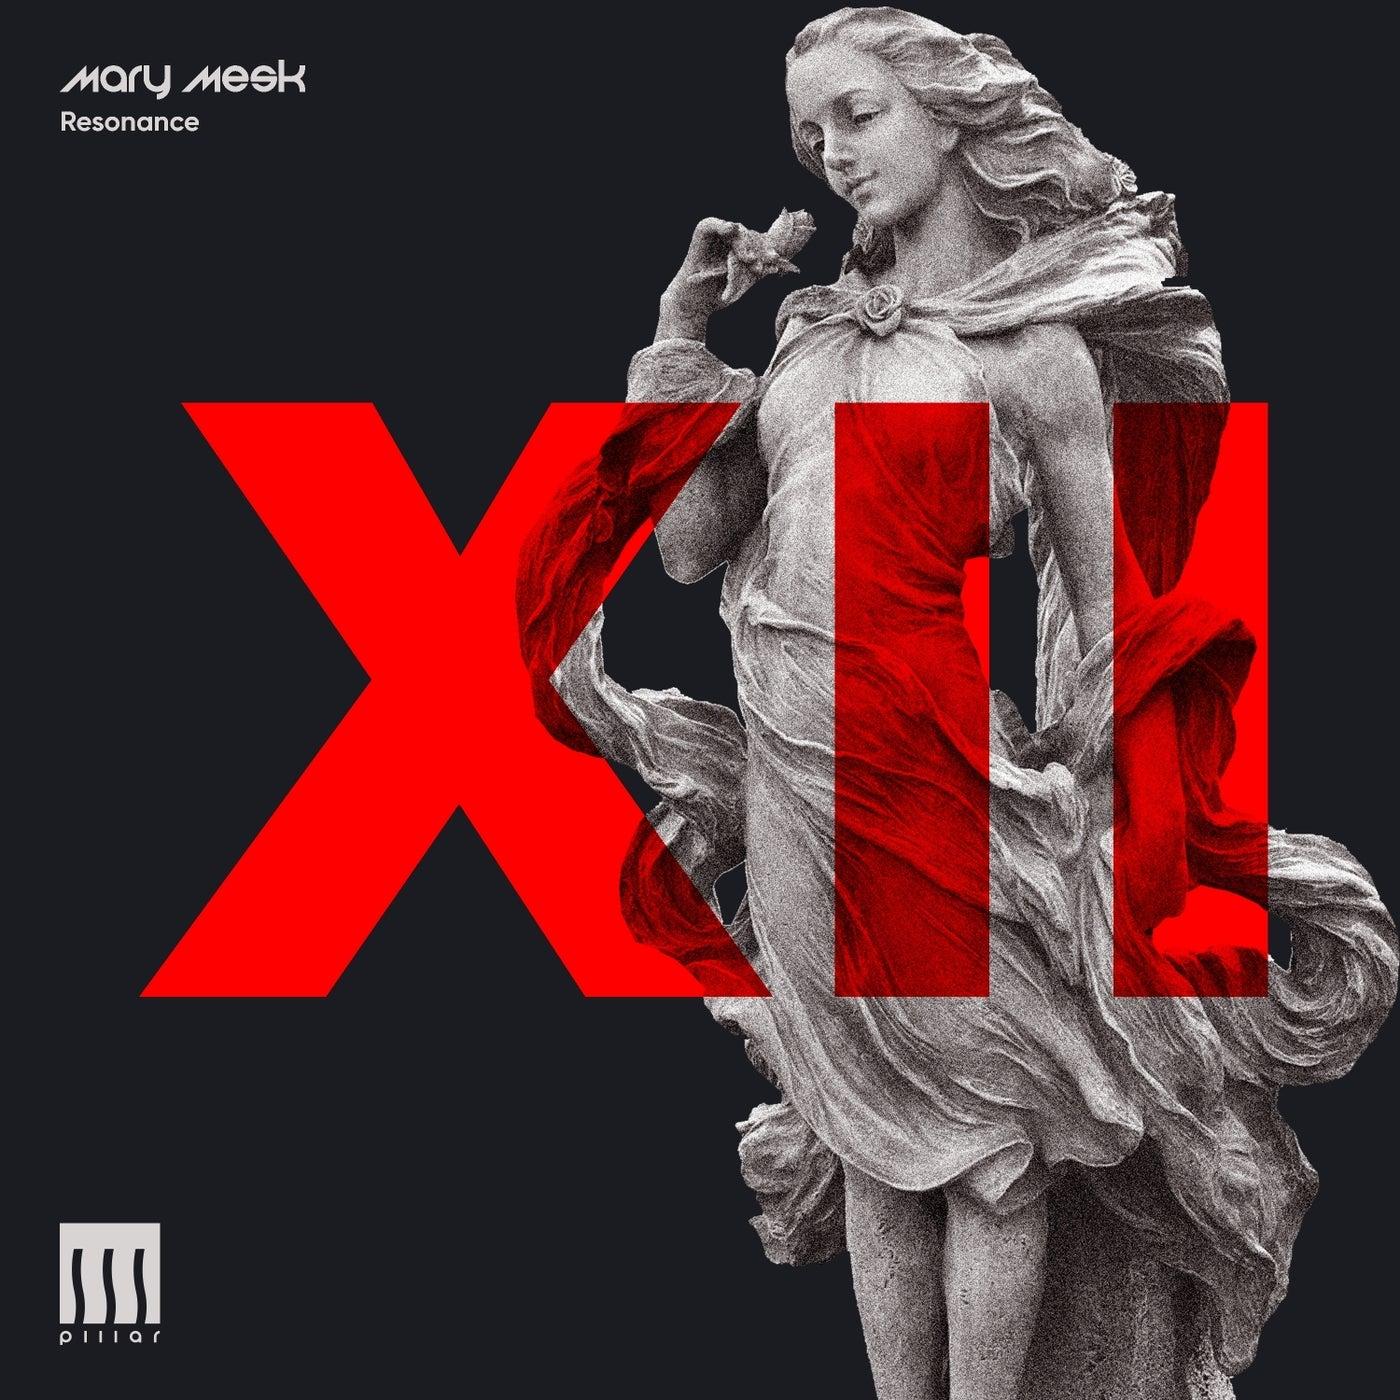 Resonance (Original Mix)